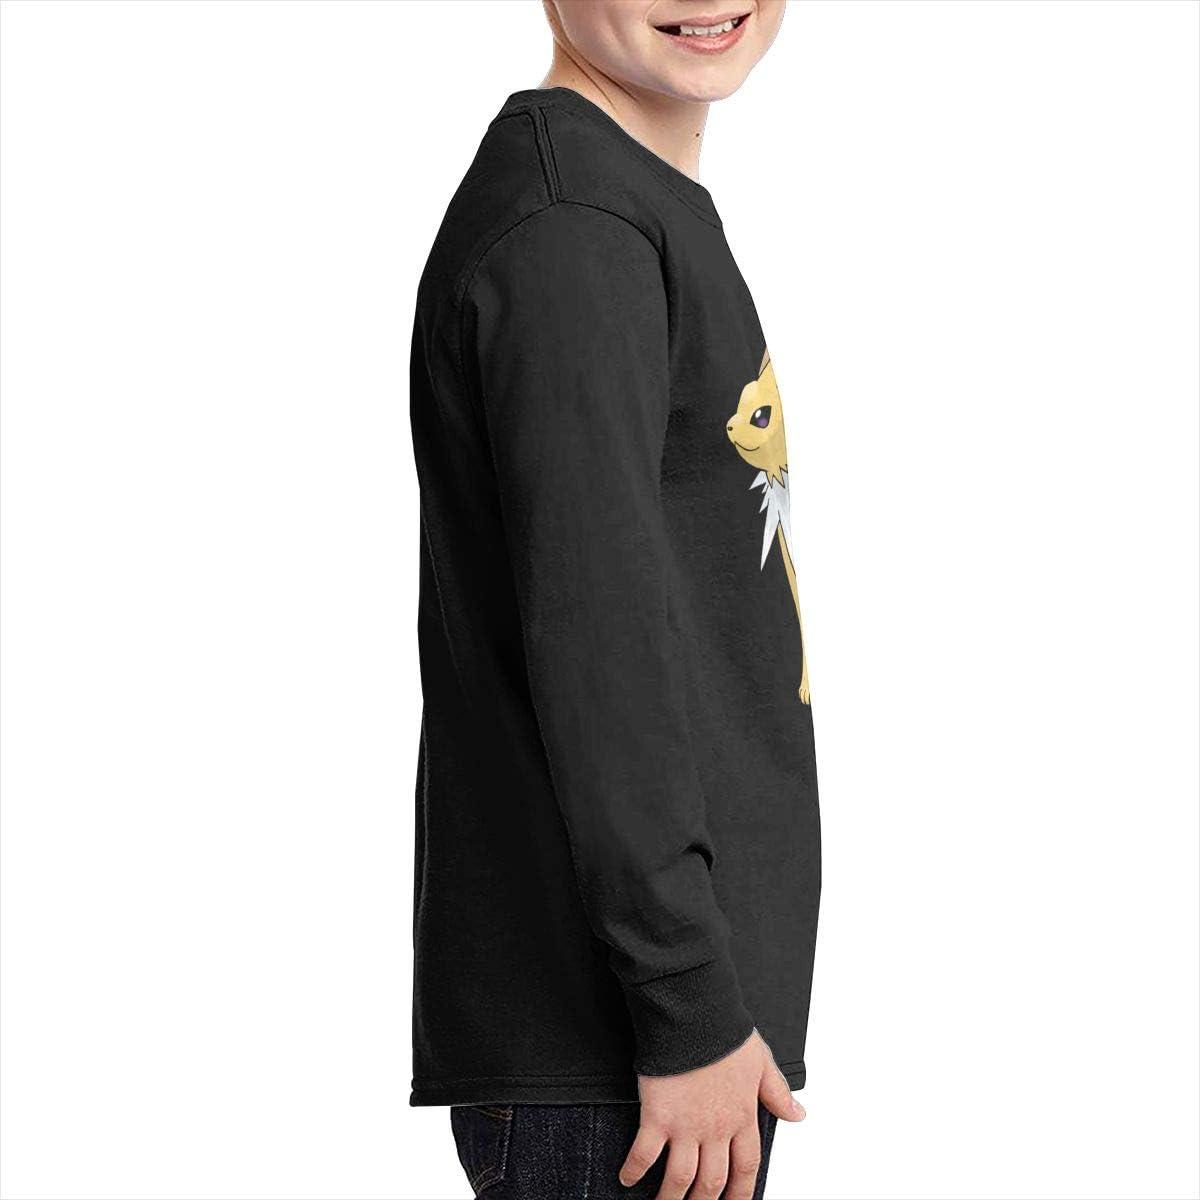 Hongansheng Trading Jolteon Cotton Leisure and Comfort Crew Neck Long Sleeve Graphic T-Shirt for Boys Girls